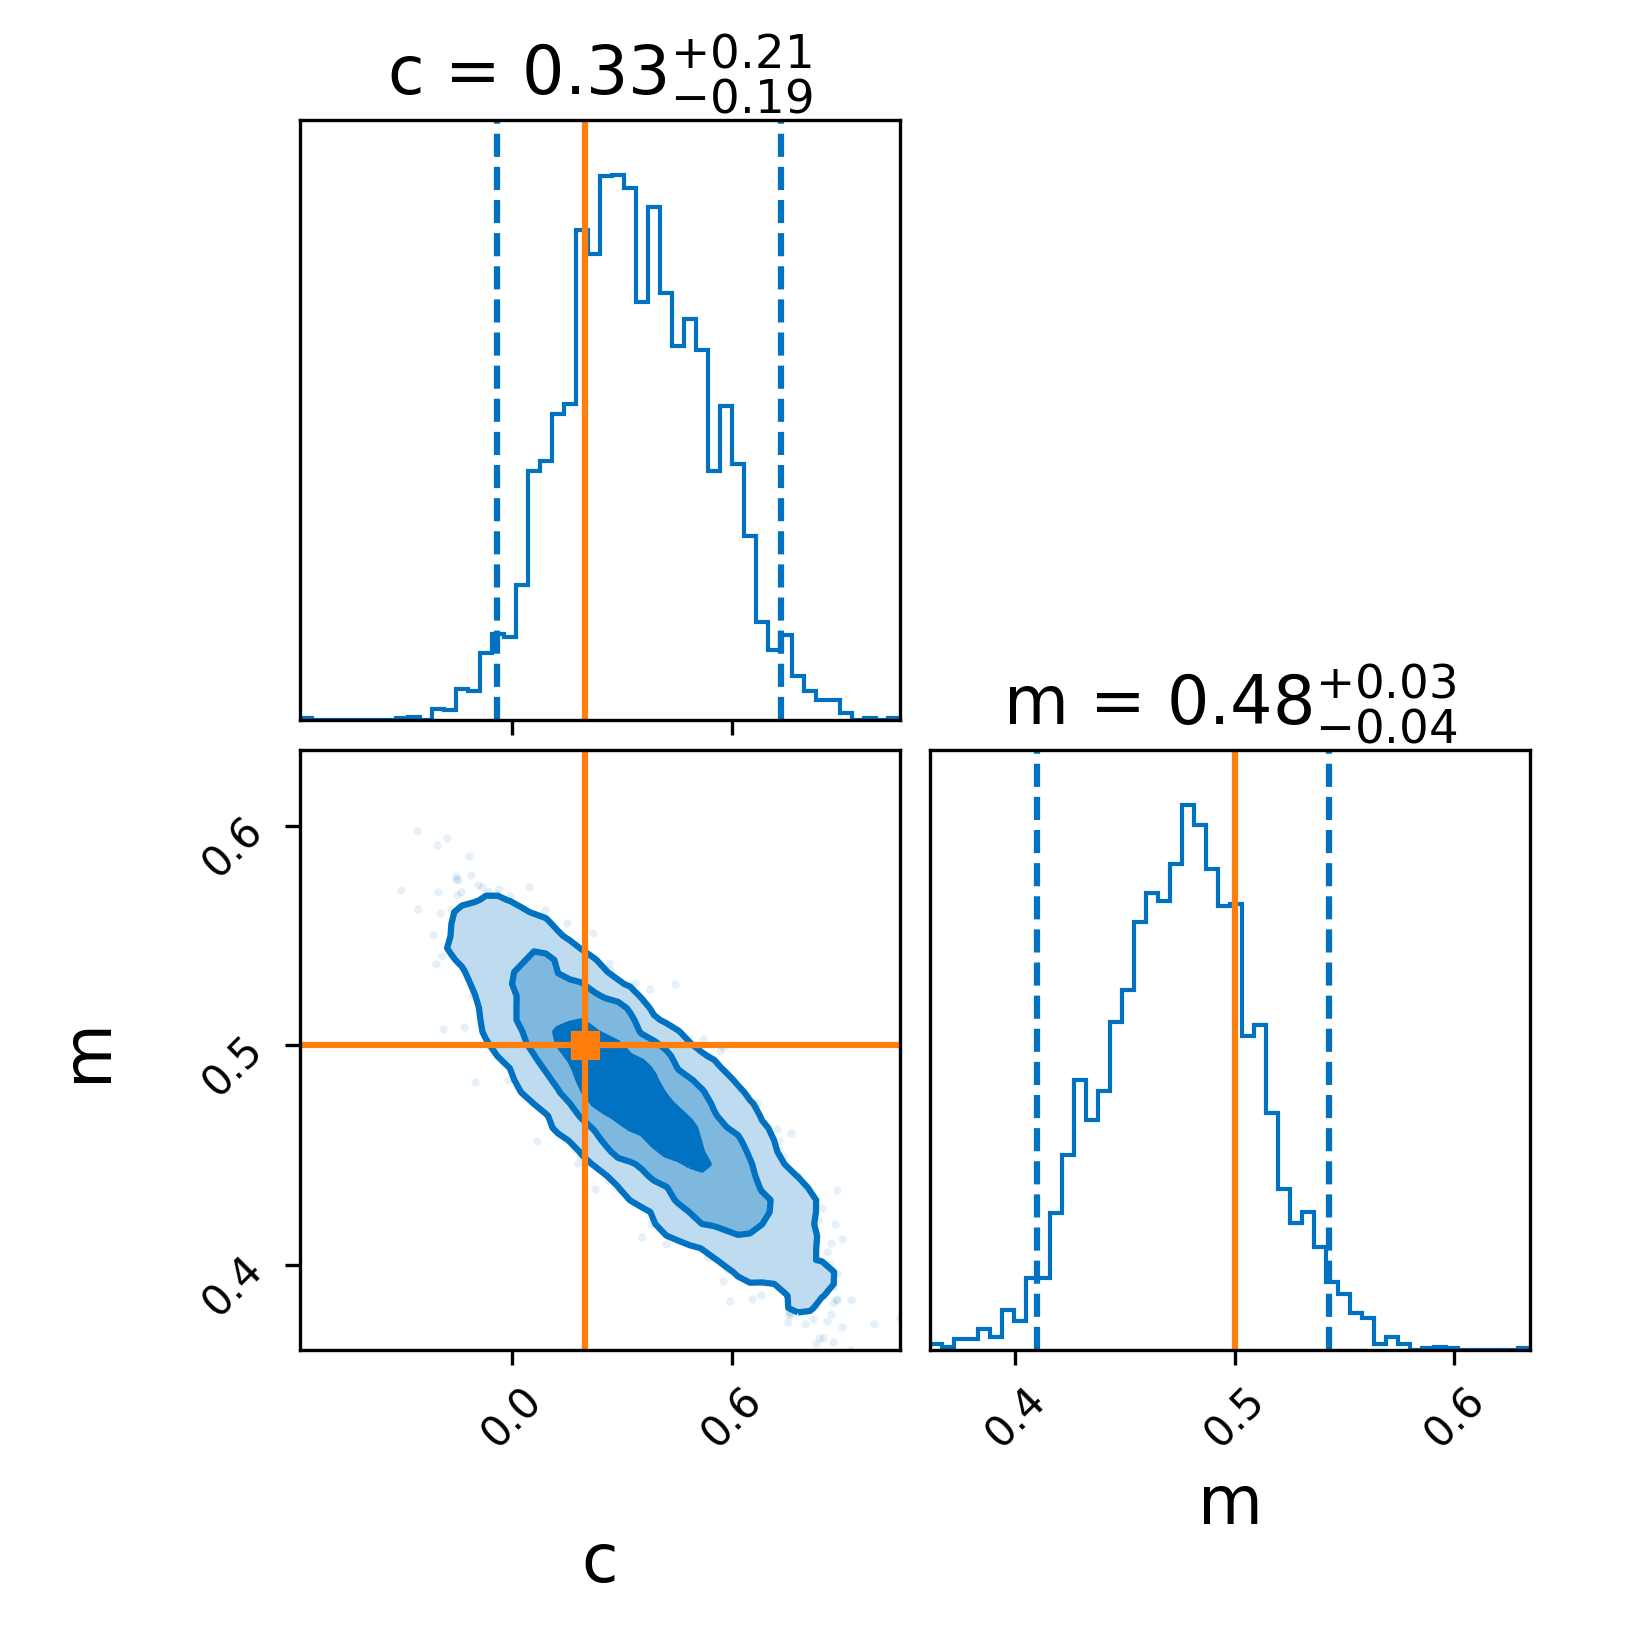 docs/images/linear-regression_corner.png